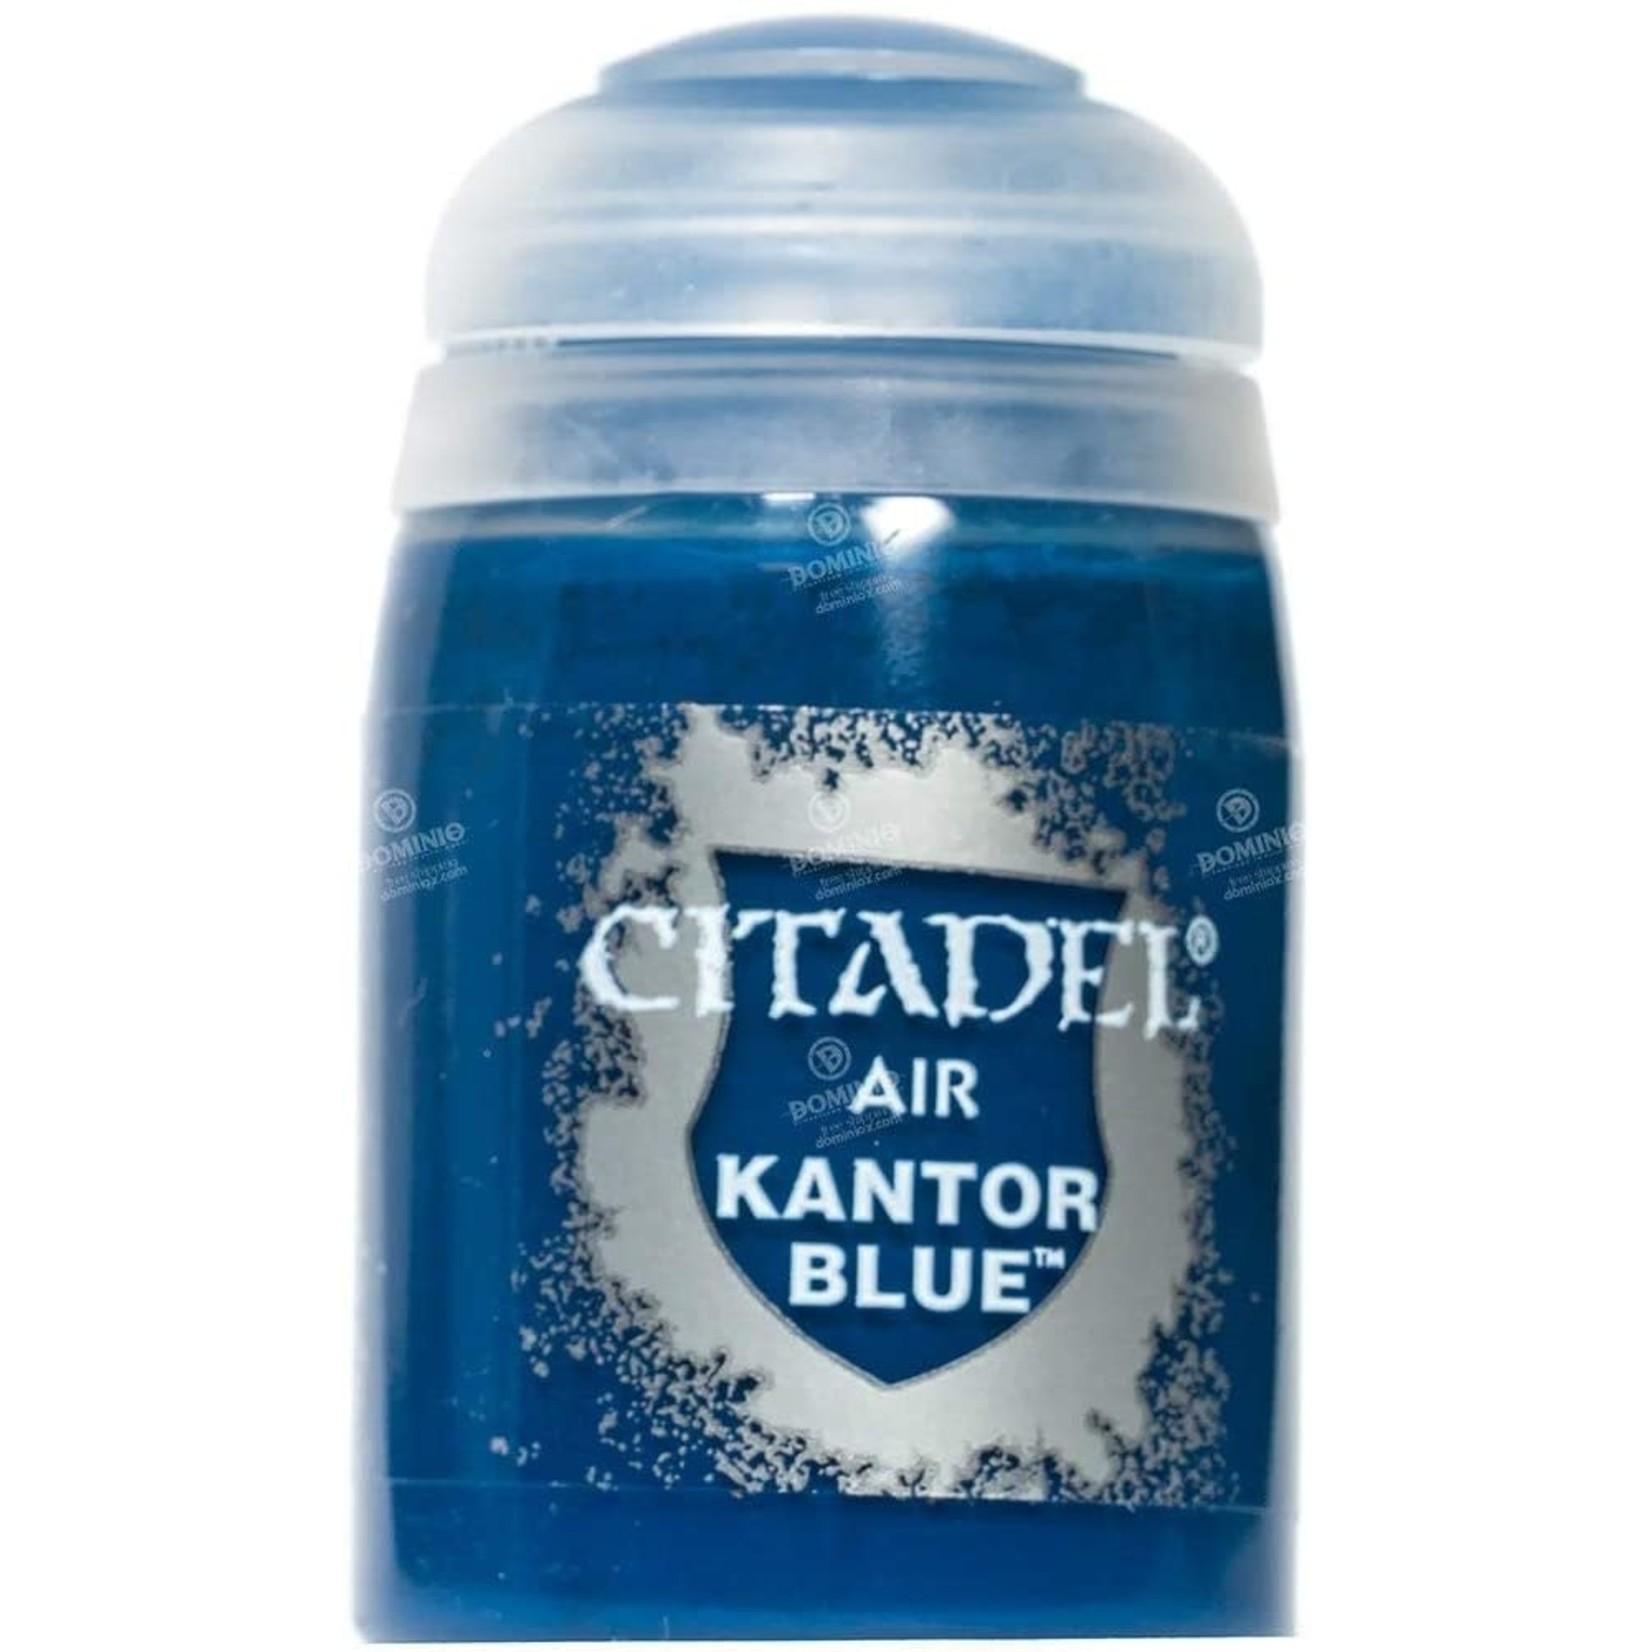 Games Workshop Citadel Paint: Kantor Blue Air (24 ml)